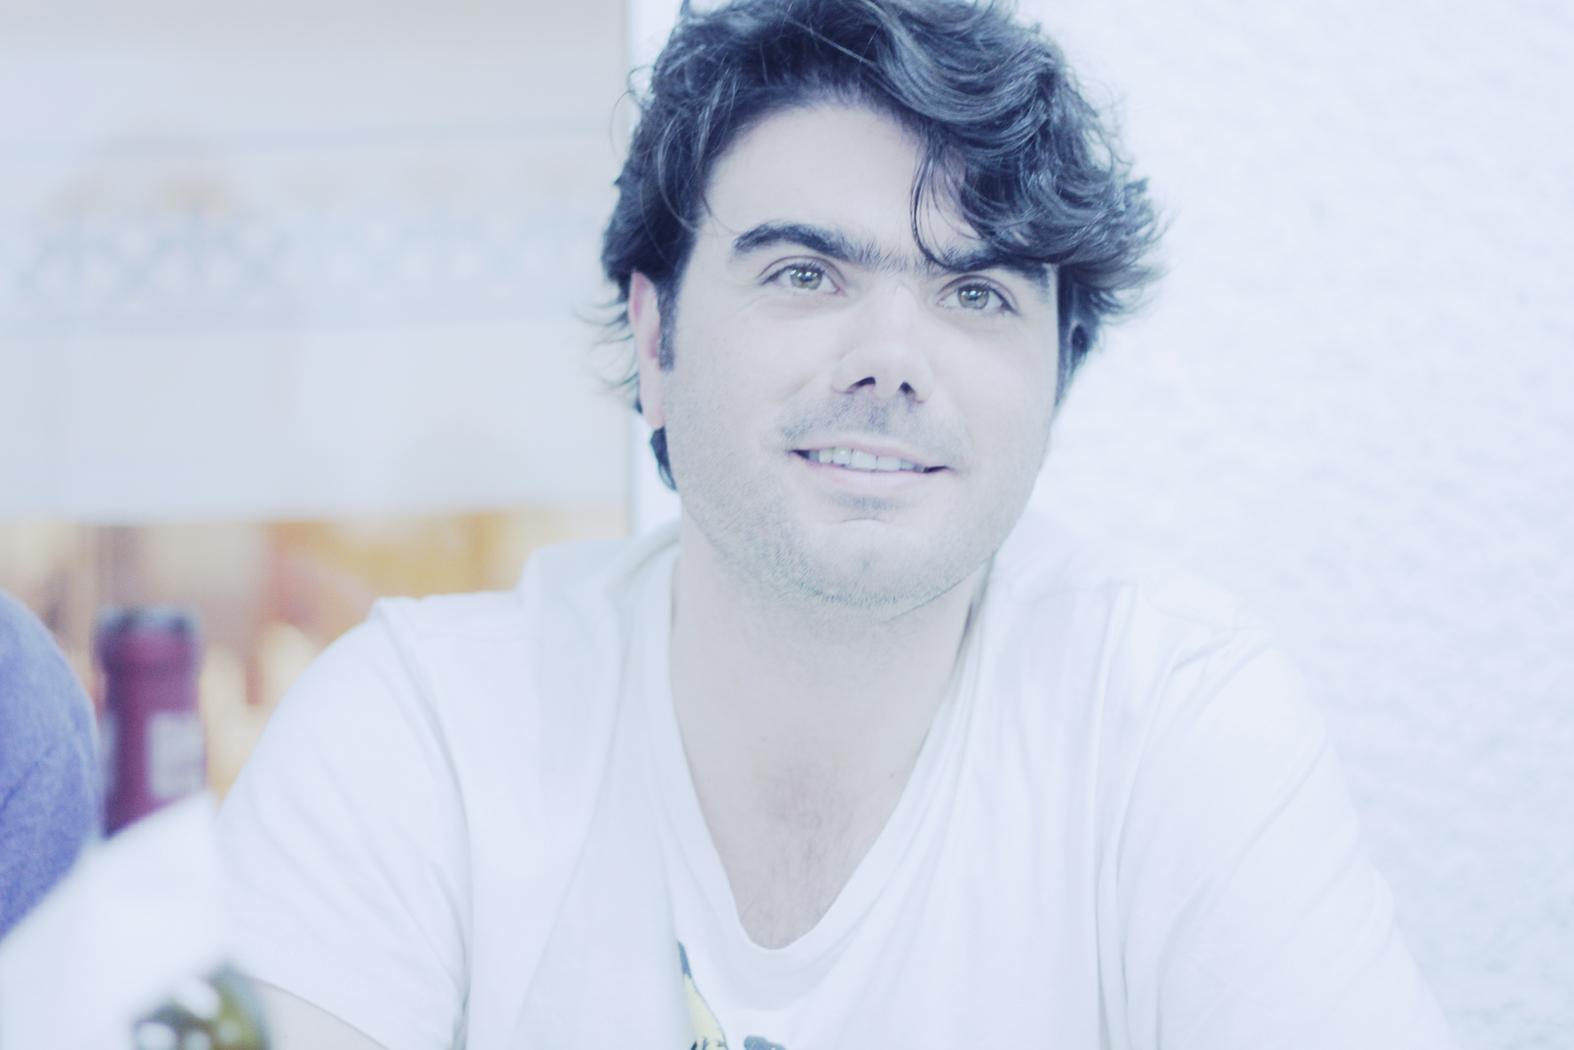 Pedro Fernandes